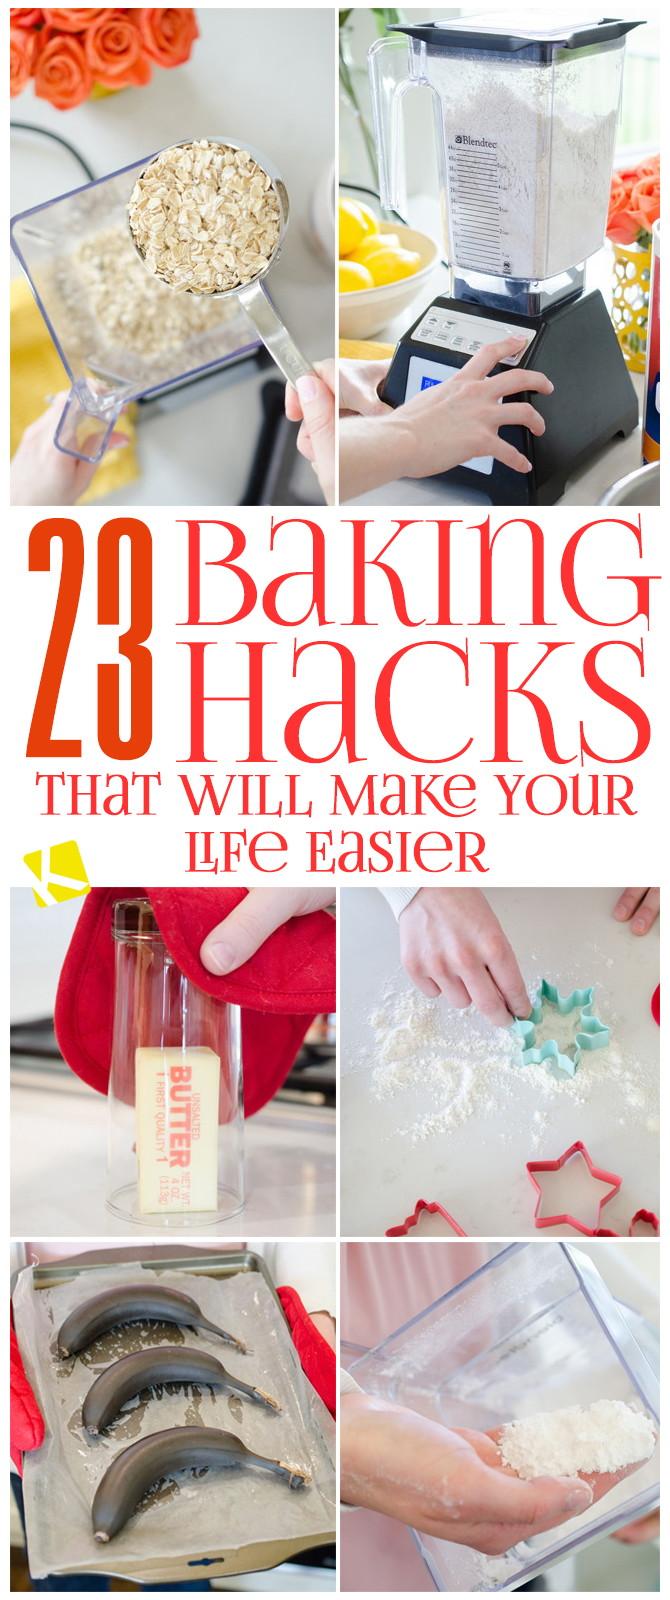 23 Genius Baking Hacks That Will Make Your Life Easier